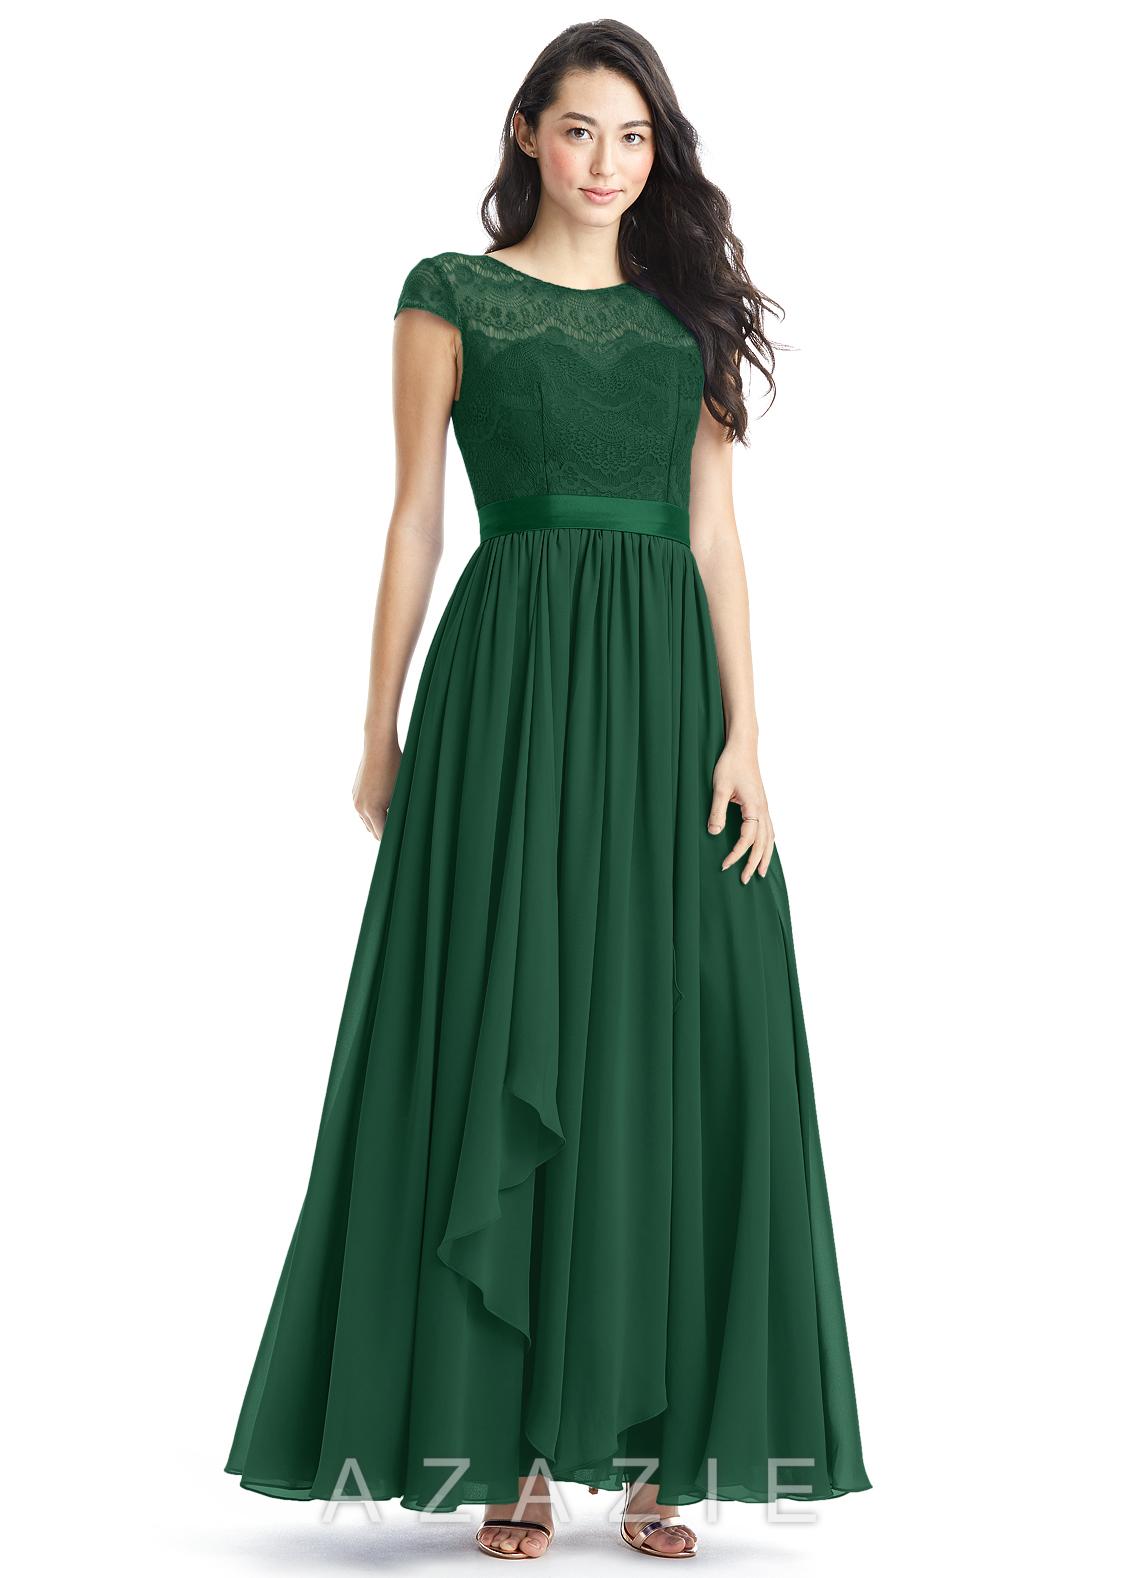 Azazie beatrice bridesmaid dress azazie for Blue green wedding dress